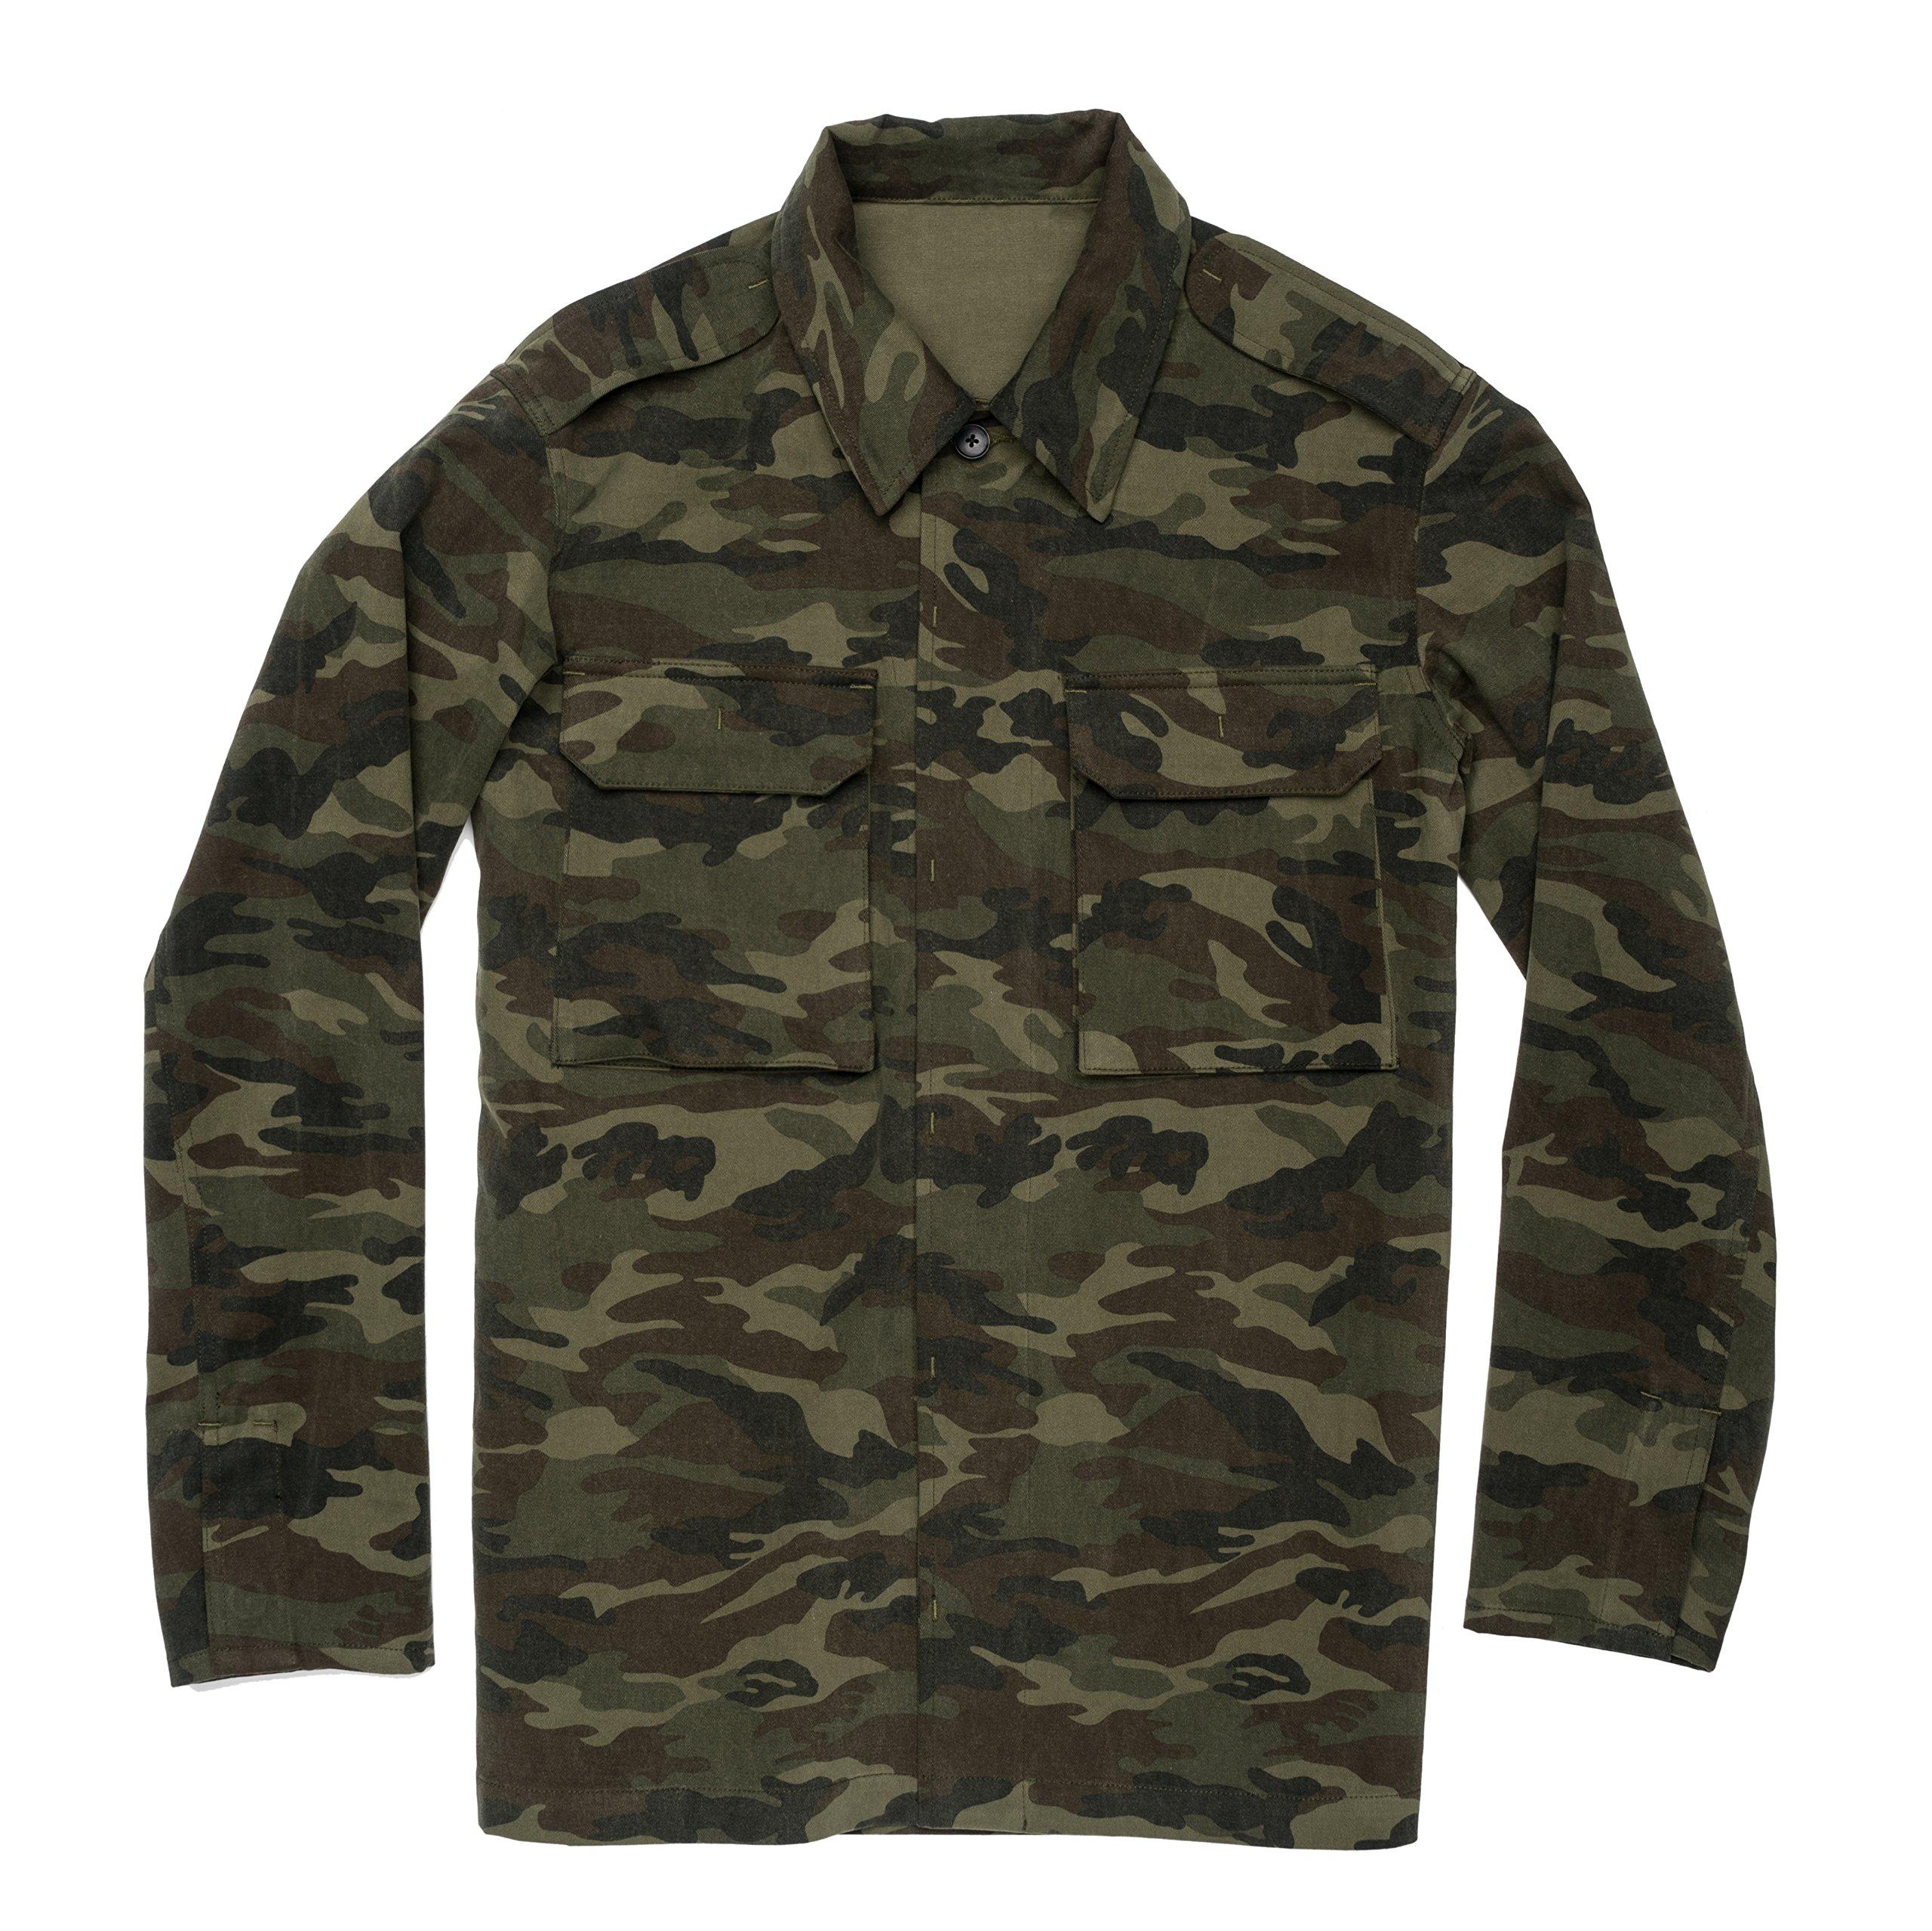 UNIFORM Tl Mens Military Jacket Camo Large